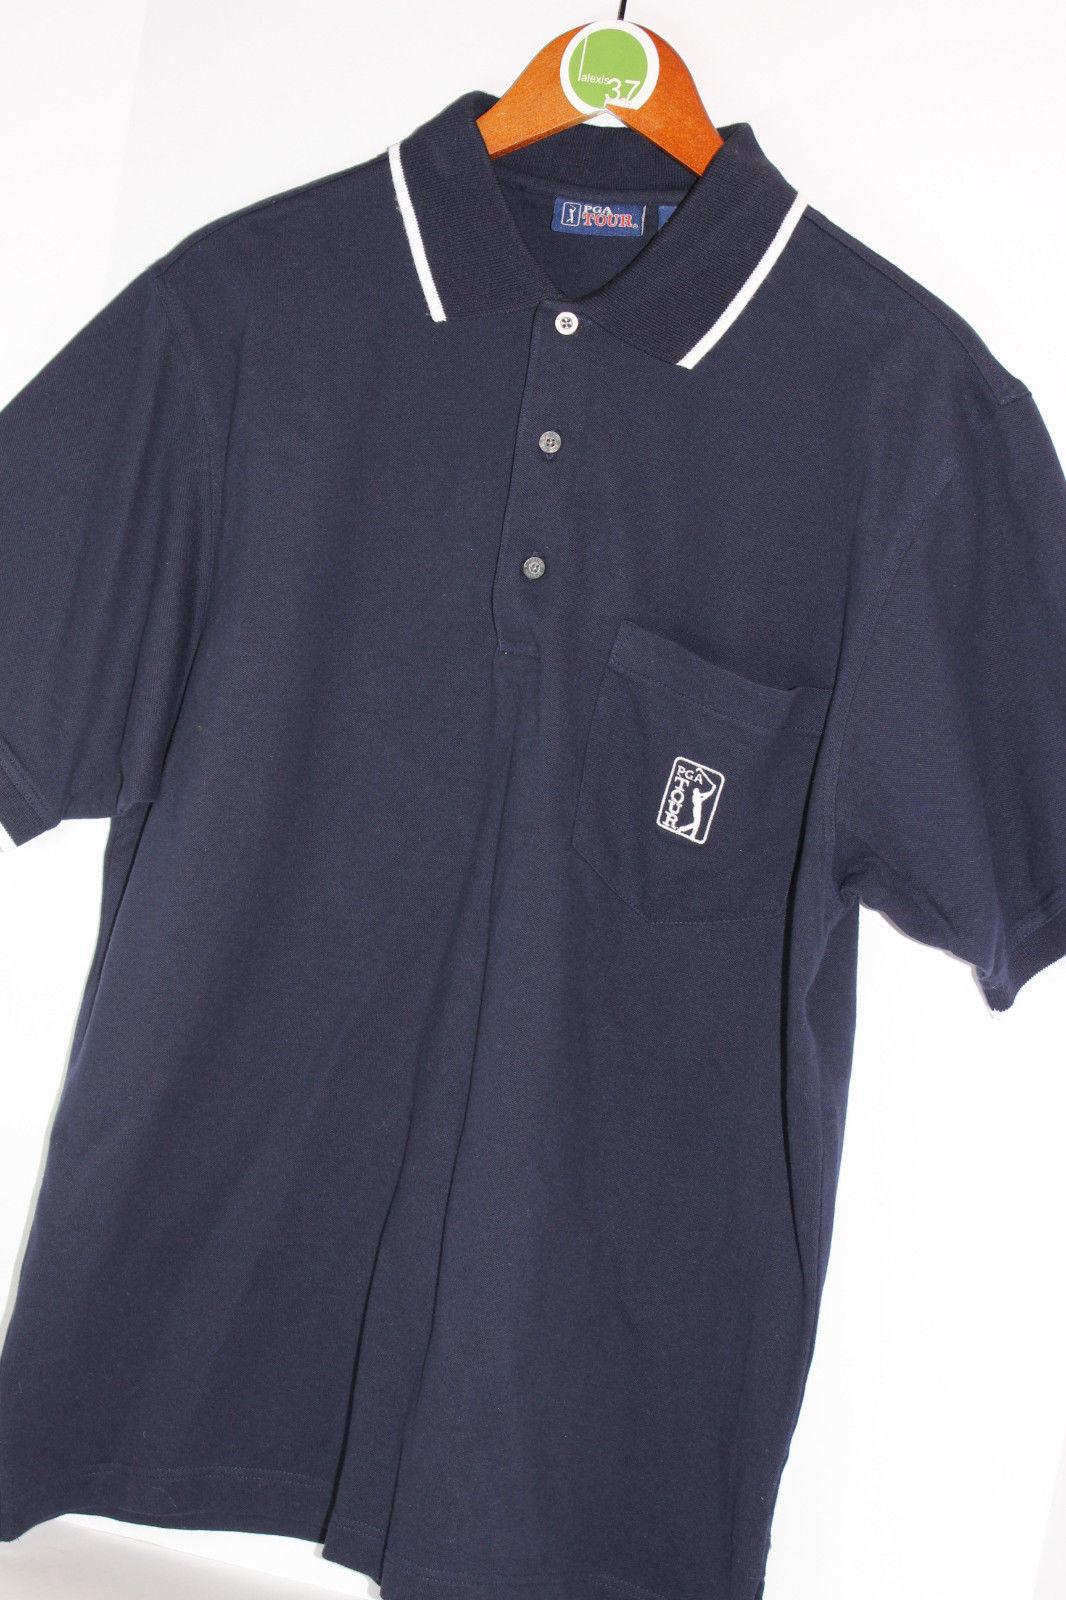 pga tour polo golf shirt embroidered logo short sleeve